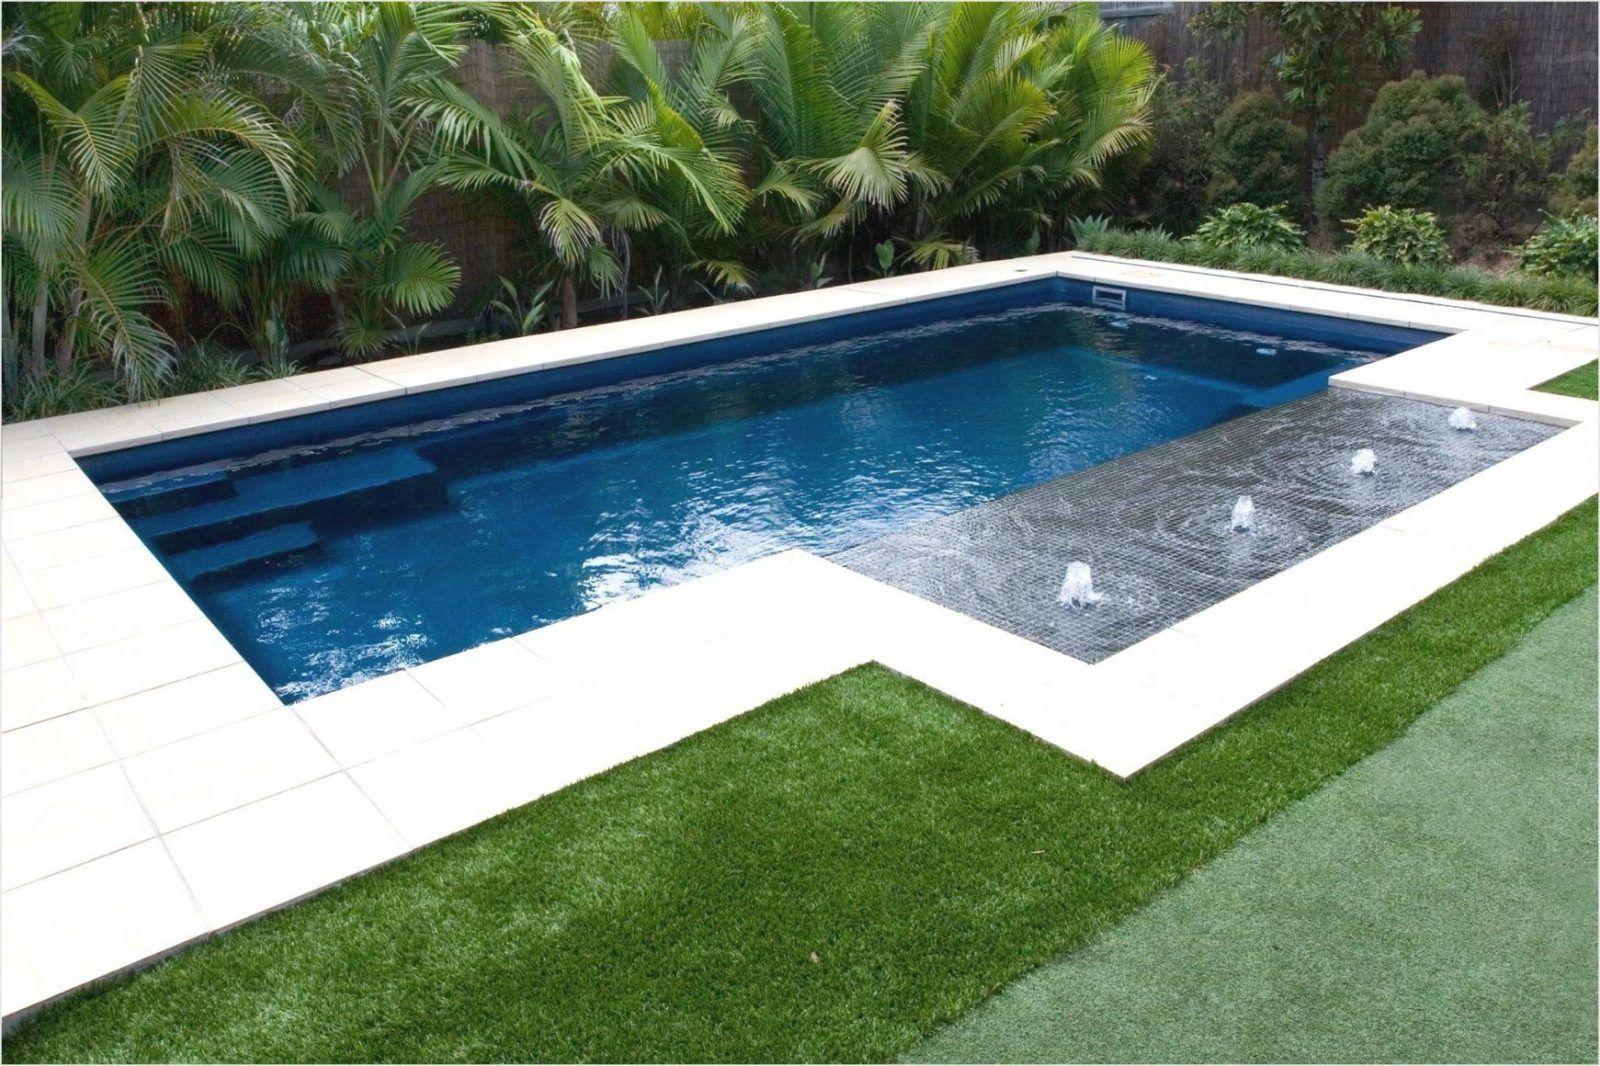 Mini Pool Im Garten Haus Design Ideen Pool Garten Mini Im Kleiner Kaufen Fur Minipool Fa Kleinen Terrassen In 2020 Pool Water Features Backyard Pool Designs